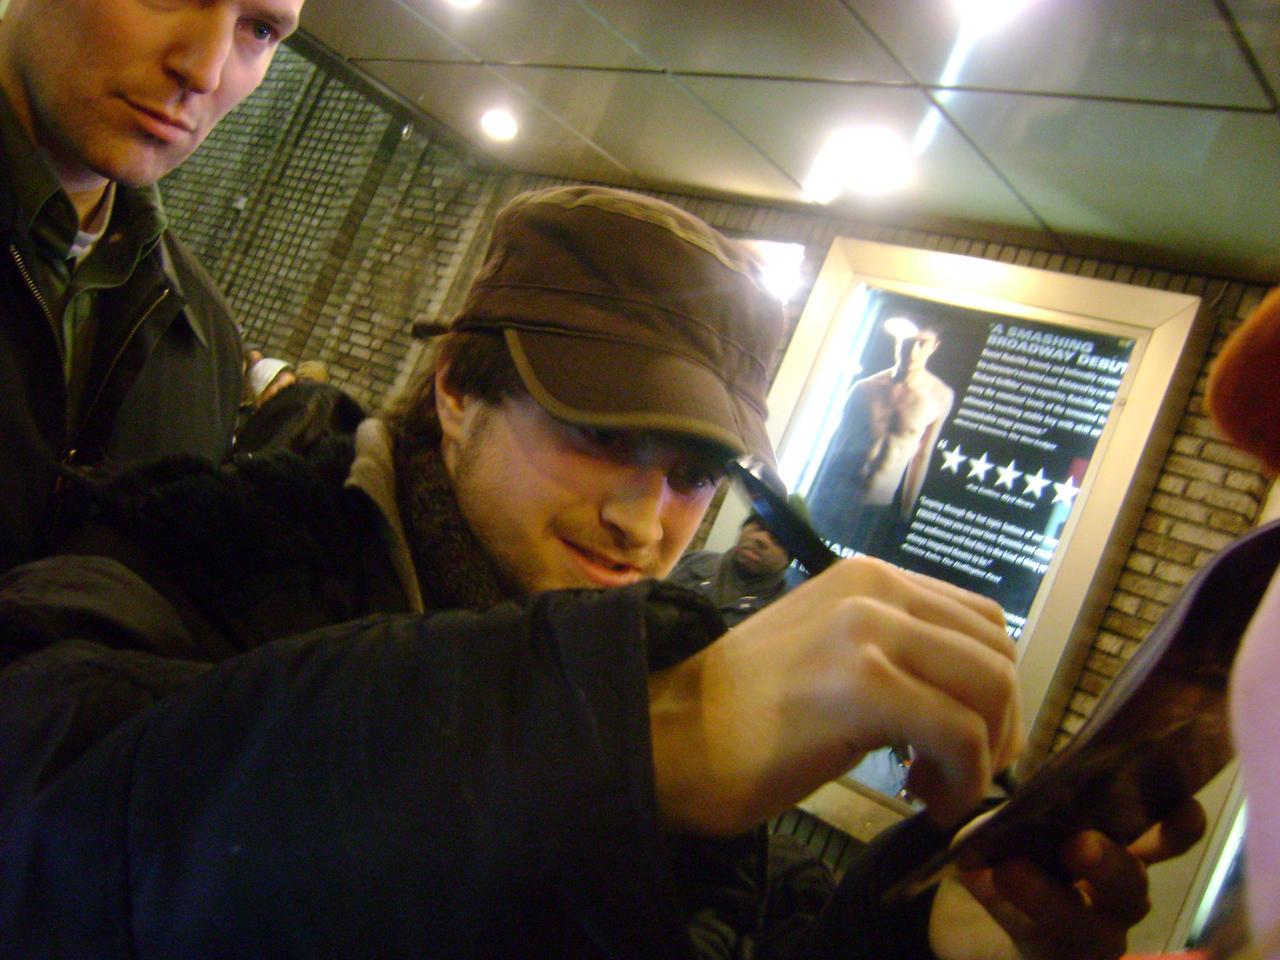 Daniel Radcliffe signing